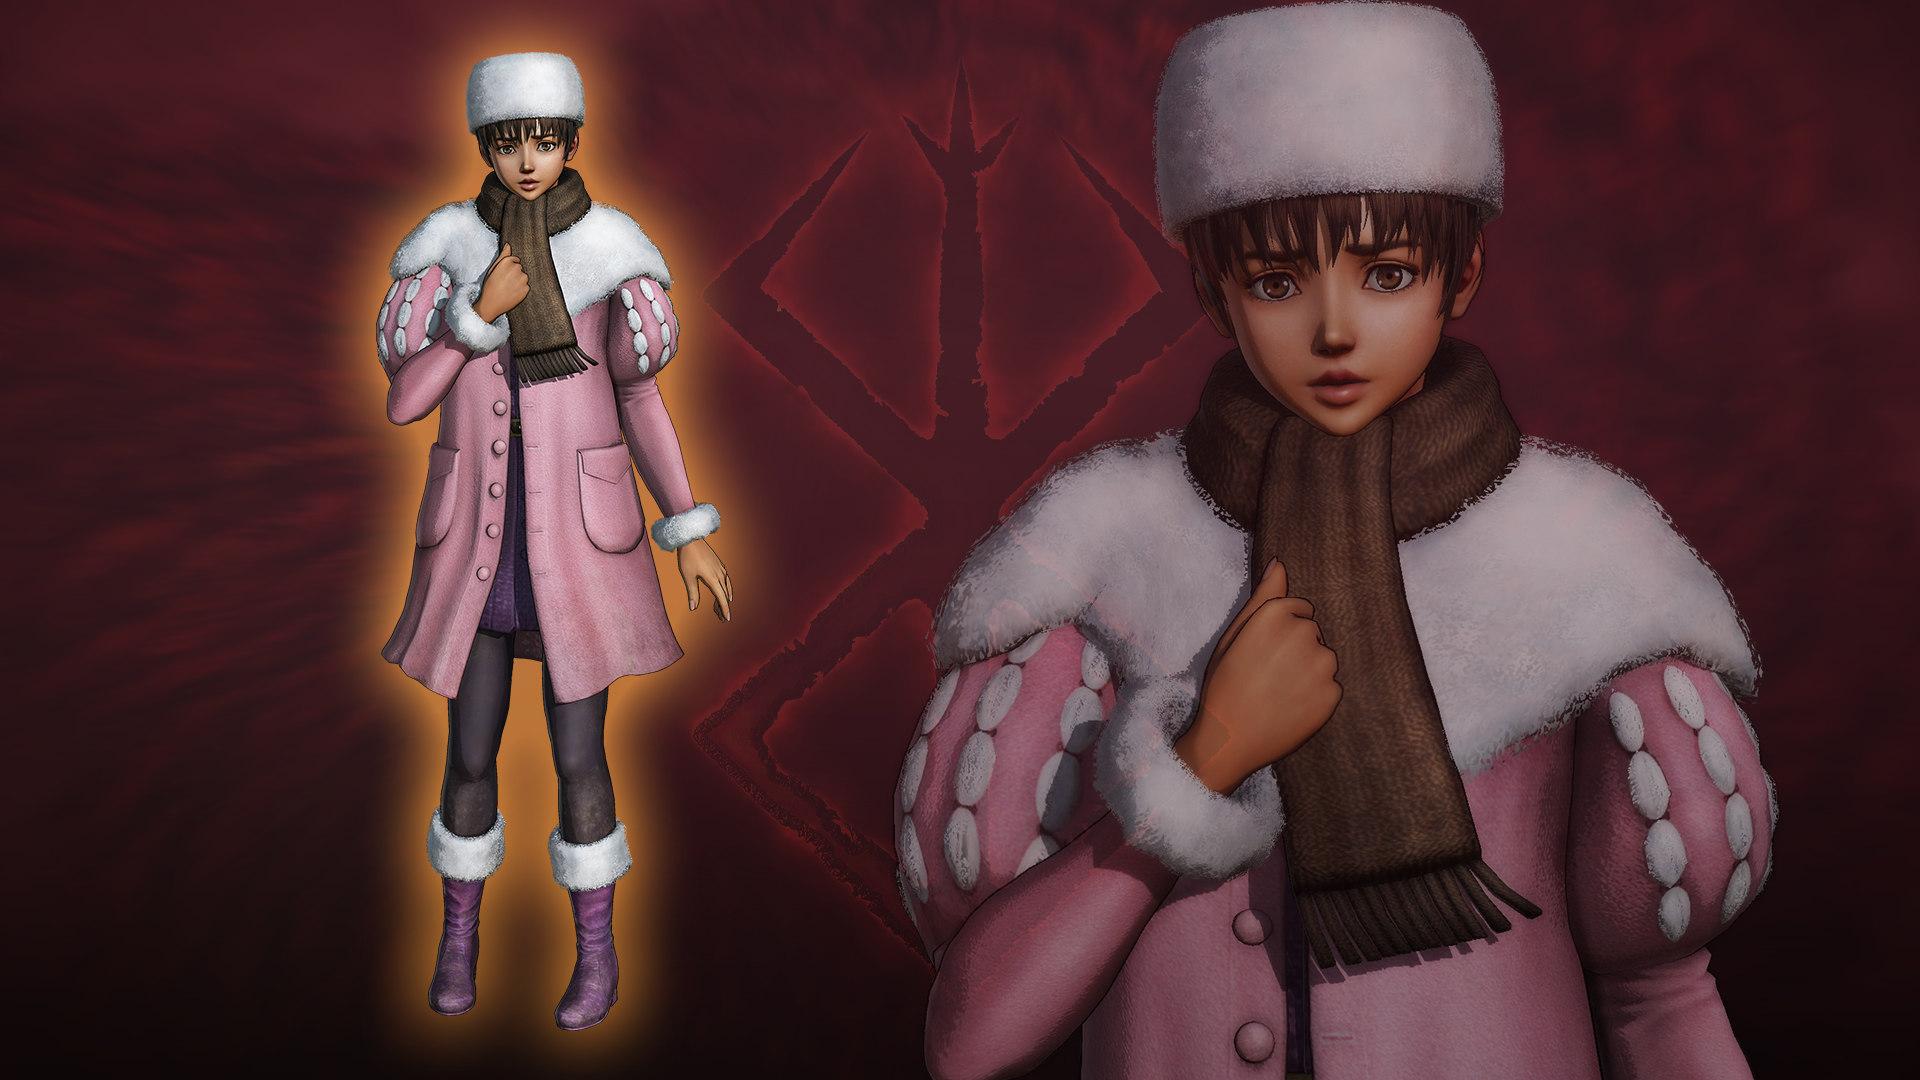 追加服裝 喀絲卡(冬季服裝Ver.) - PS4 | PlayStation™Store官方網站 香港